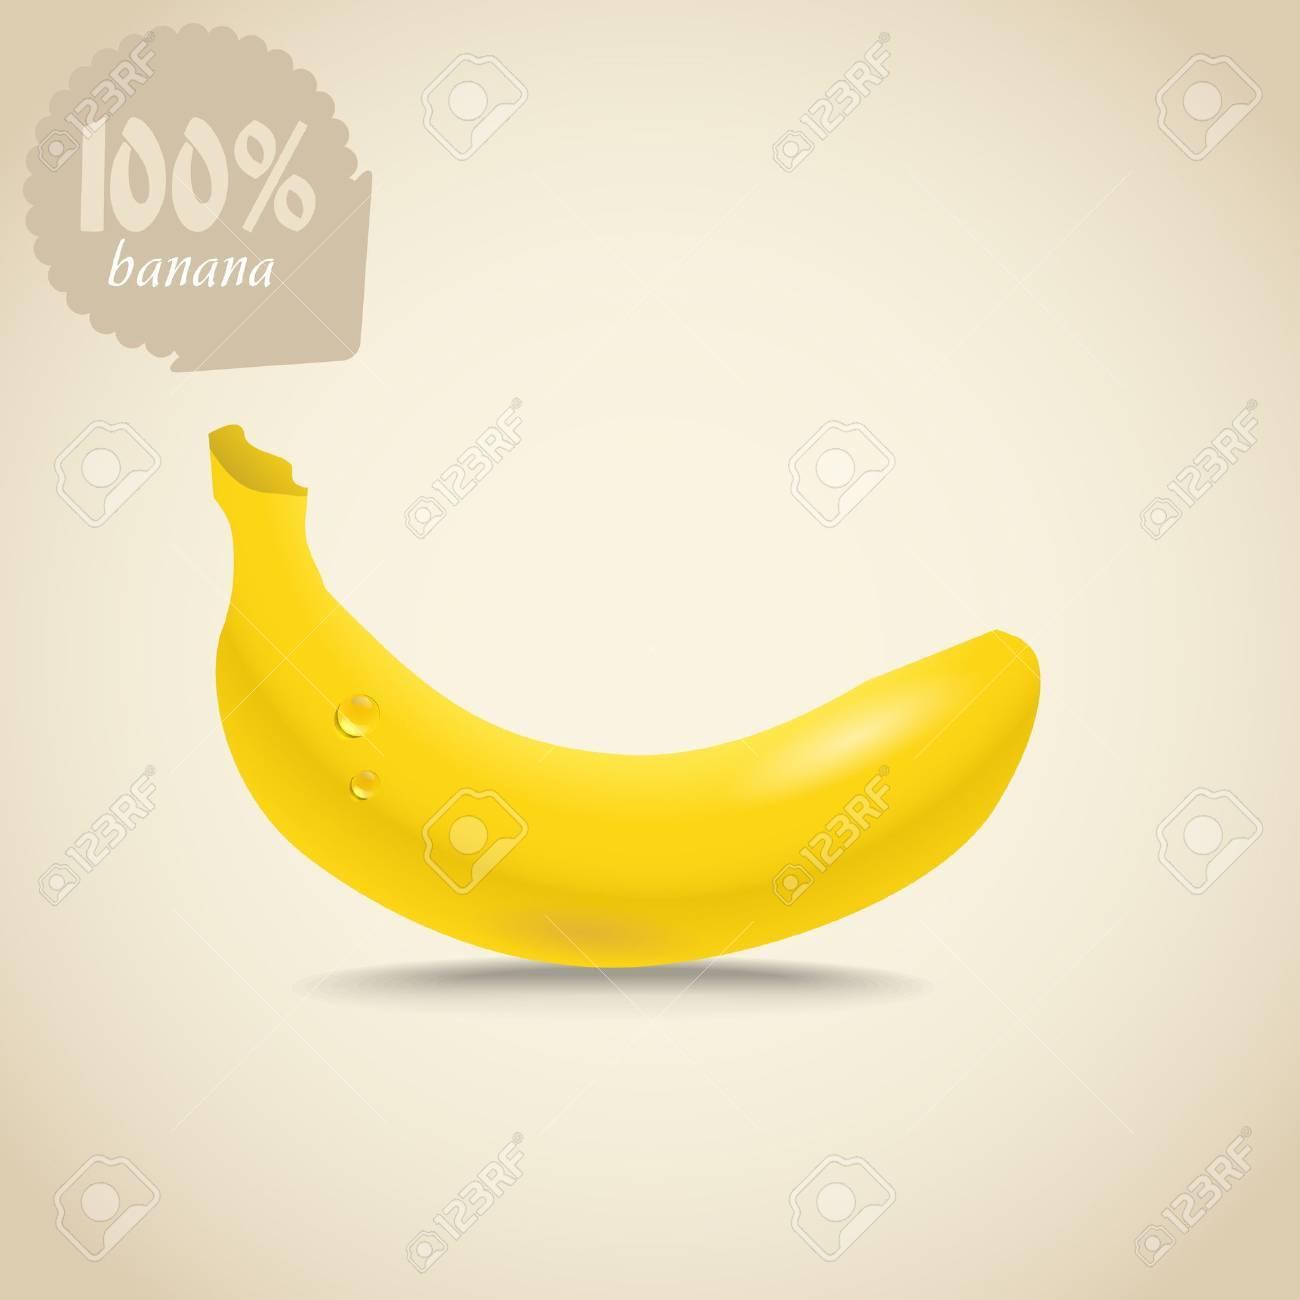 Banana Stock Vector - 11884609